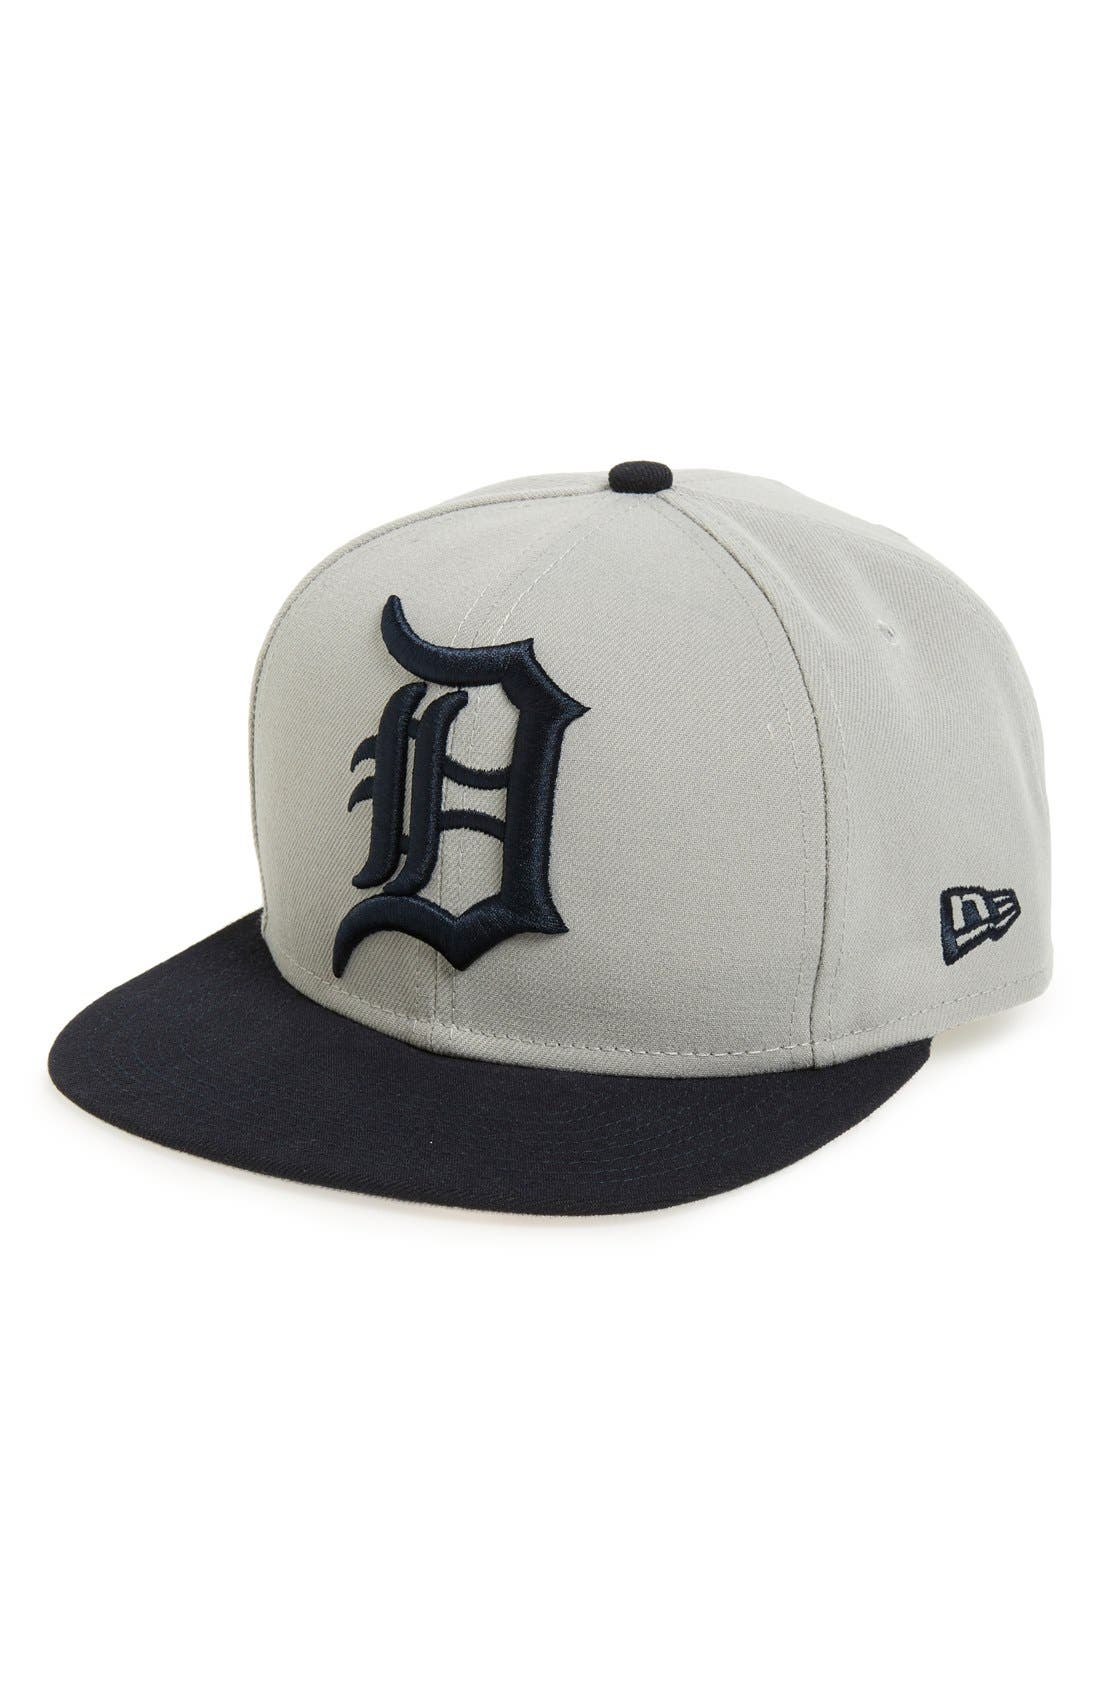 Alternate Image 1 Selected - New Era Cap 'Detroit Tigers' Snapback Cap